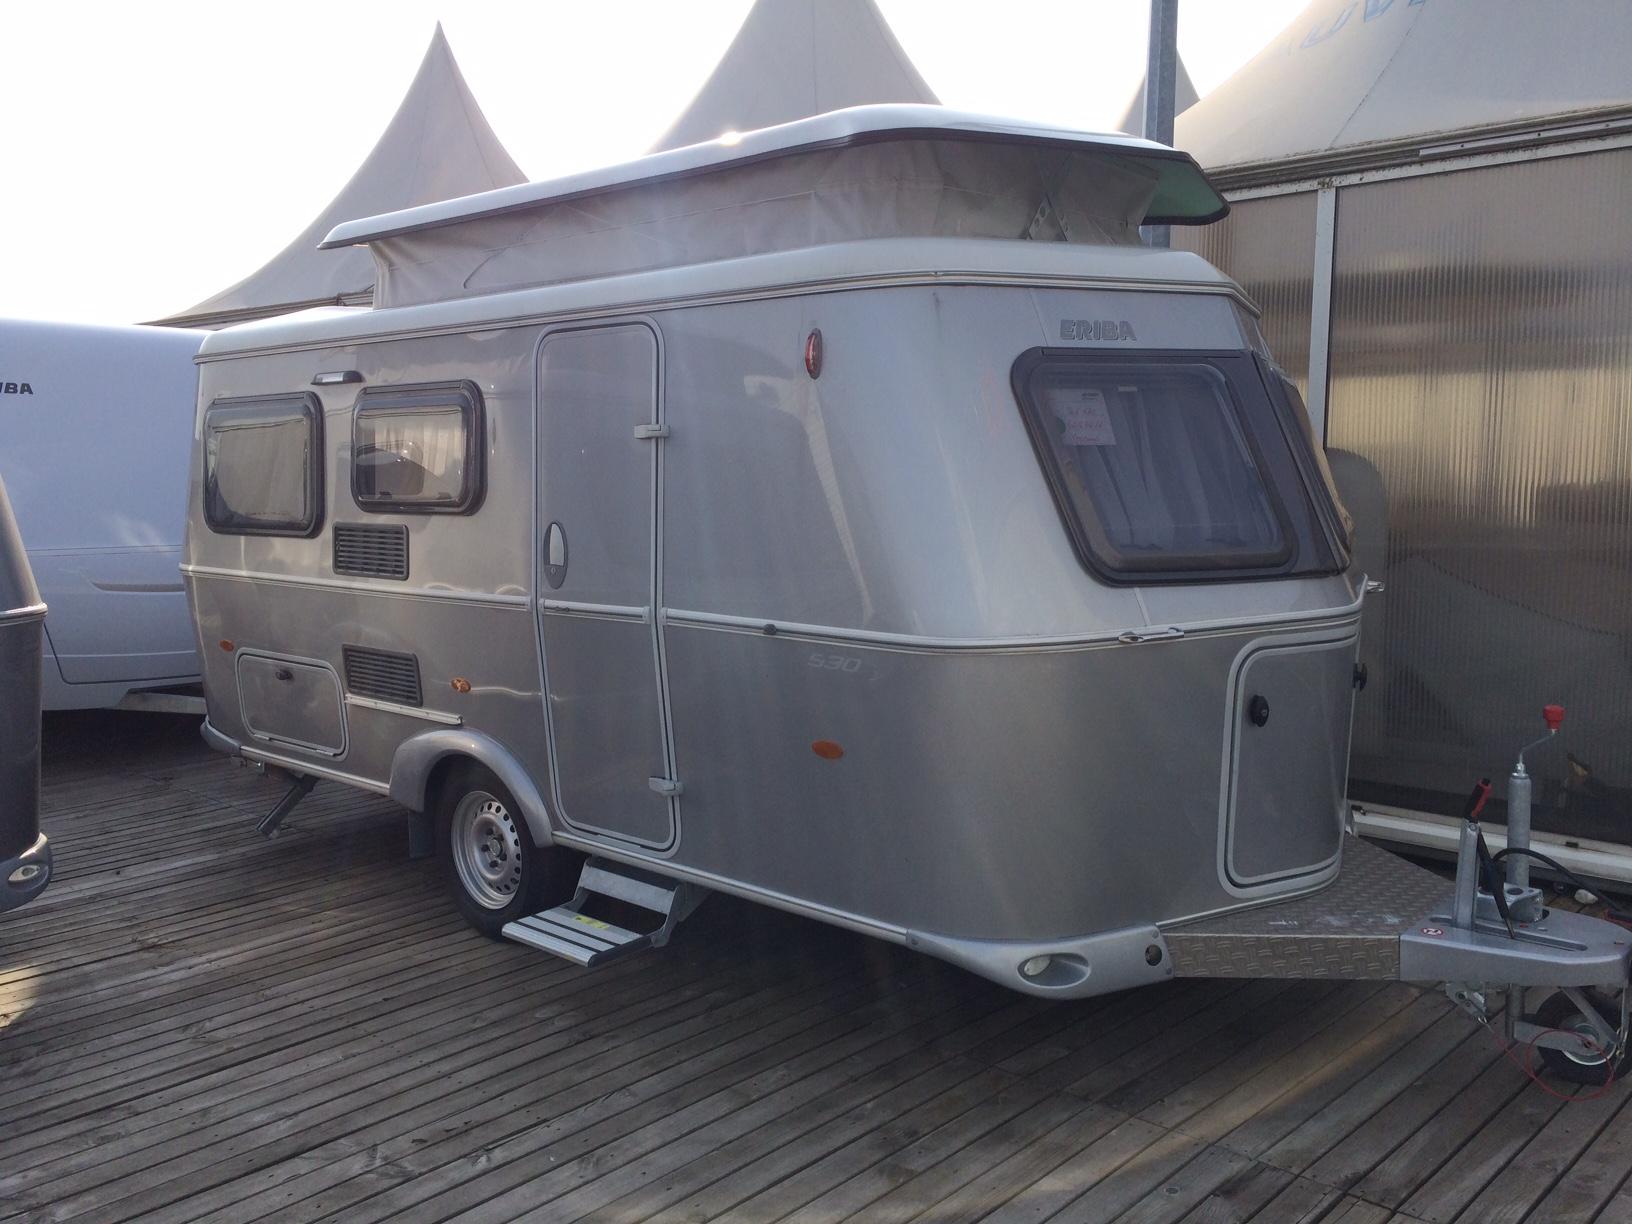 eriba troll 530 silver edition occasion caravane en vente saint priest rhone 69. Black Bedroom Furniture Sets. Home Design Ideas